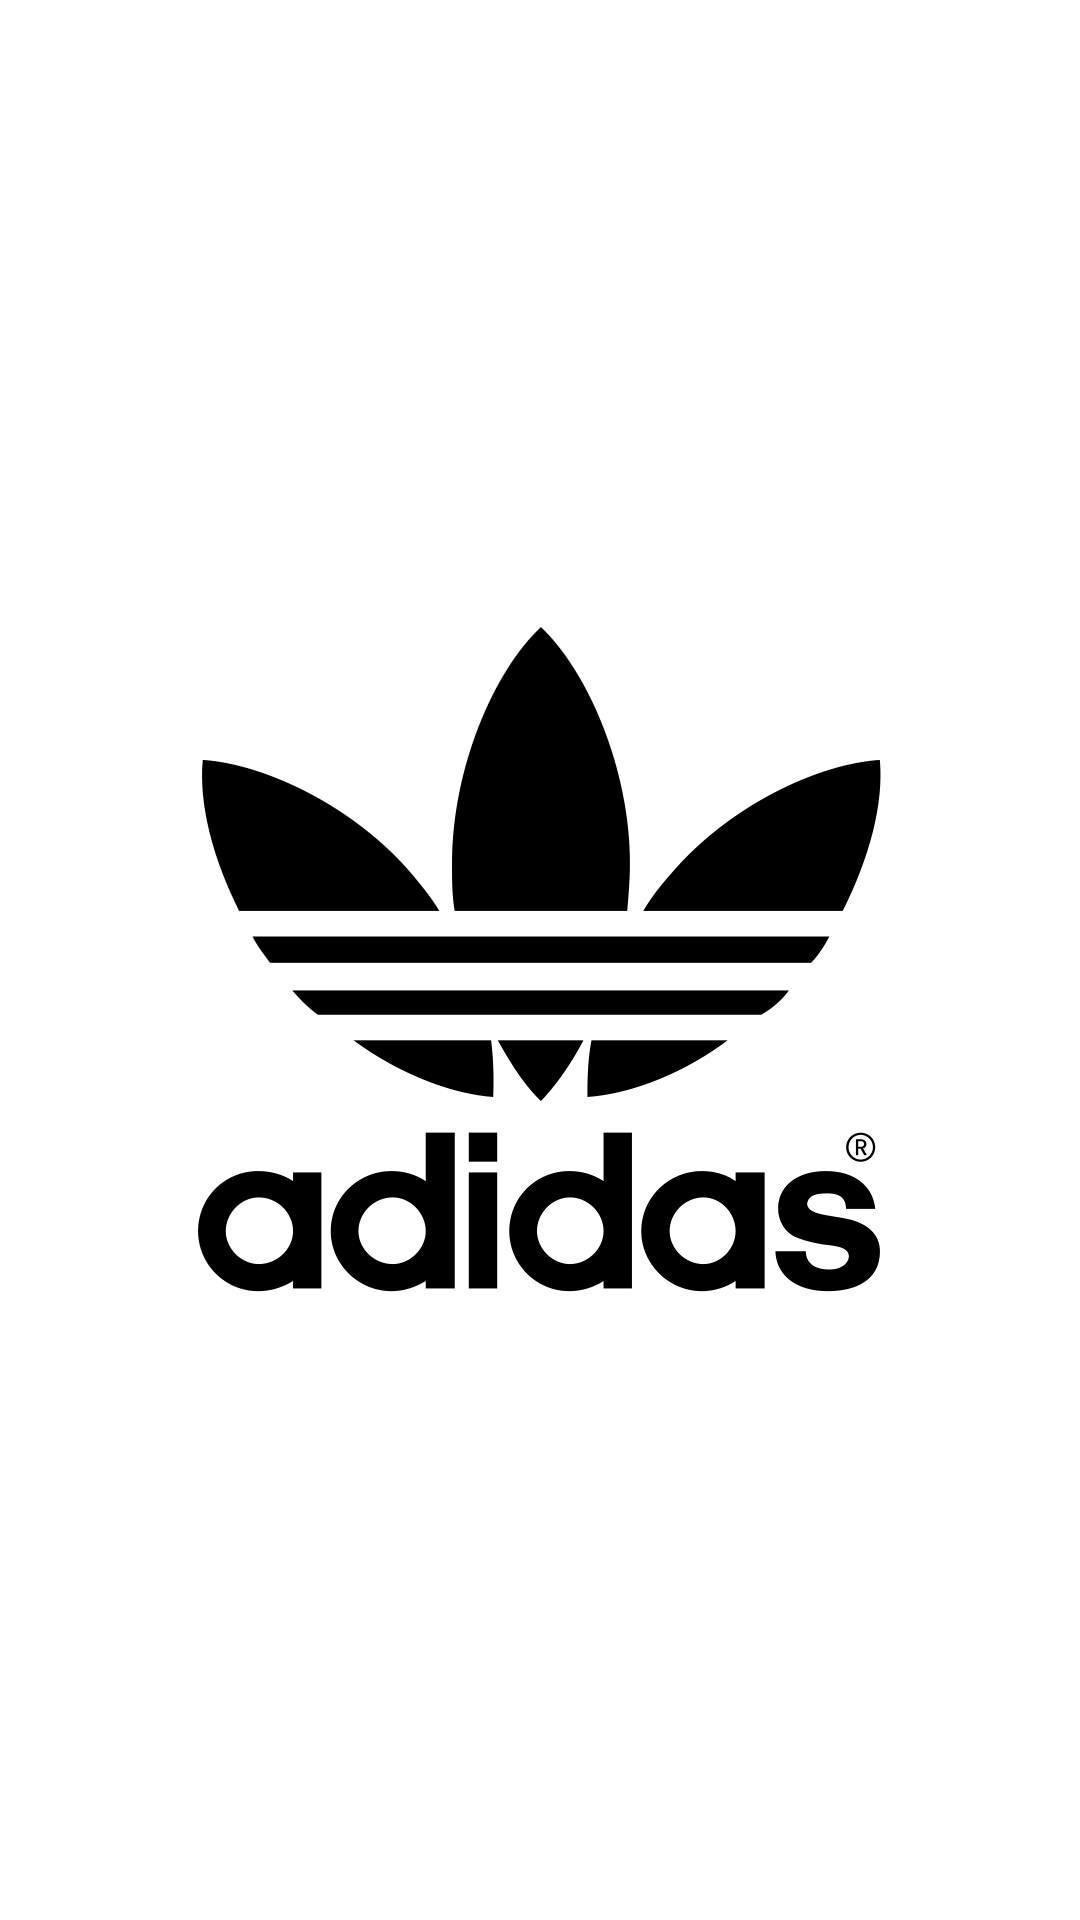 adidas Logo iPhone Wallpaper